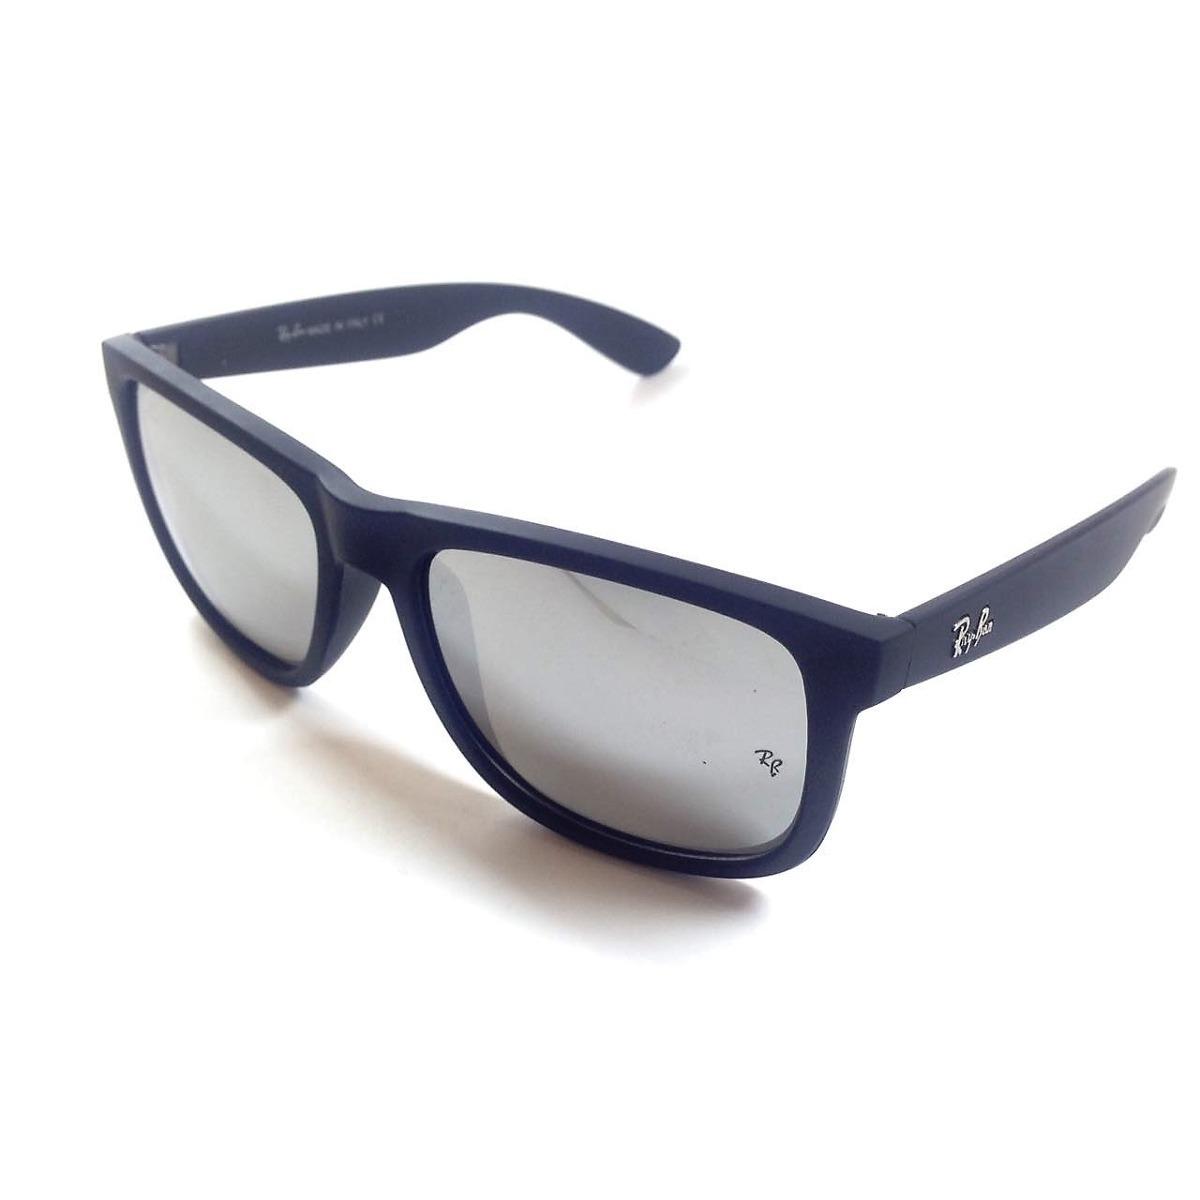 3787e83ceb6b5 óculos sol ray ban justin rb4165 prata espelhado polarizado. Carregando  zoom.